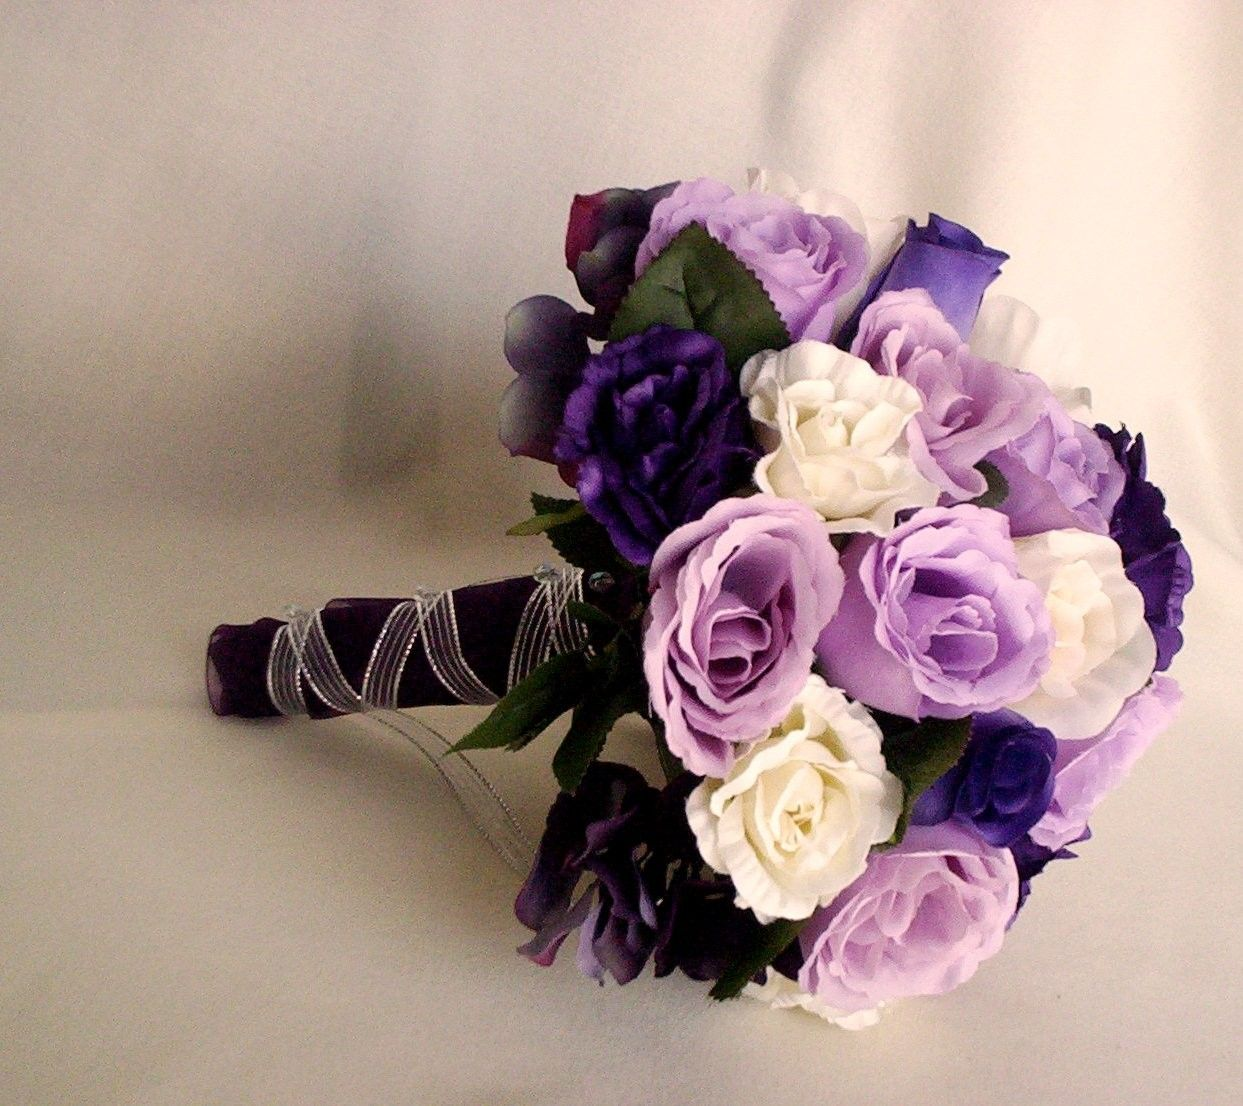 Pin By Lisa Moy On Wedding Purple Wedding Flowers Flower Bouquet Wedding Pink Wedding Flowers